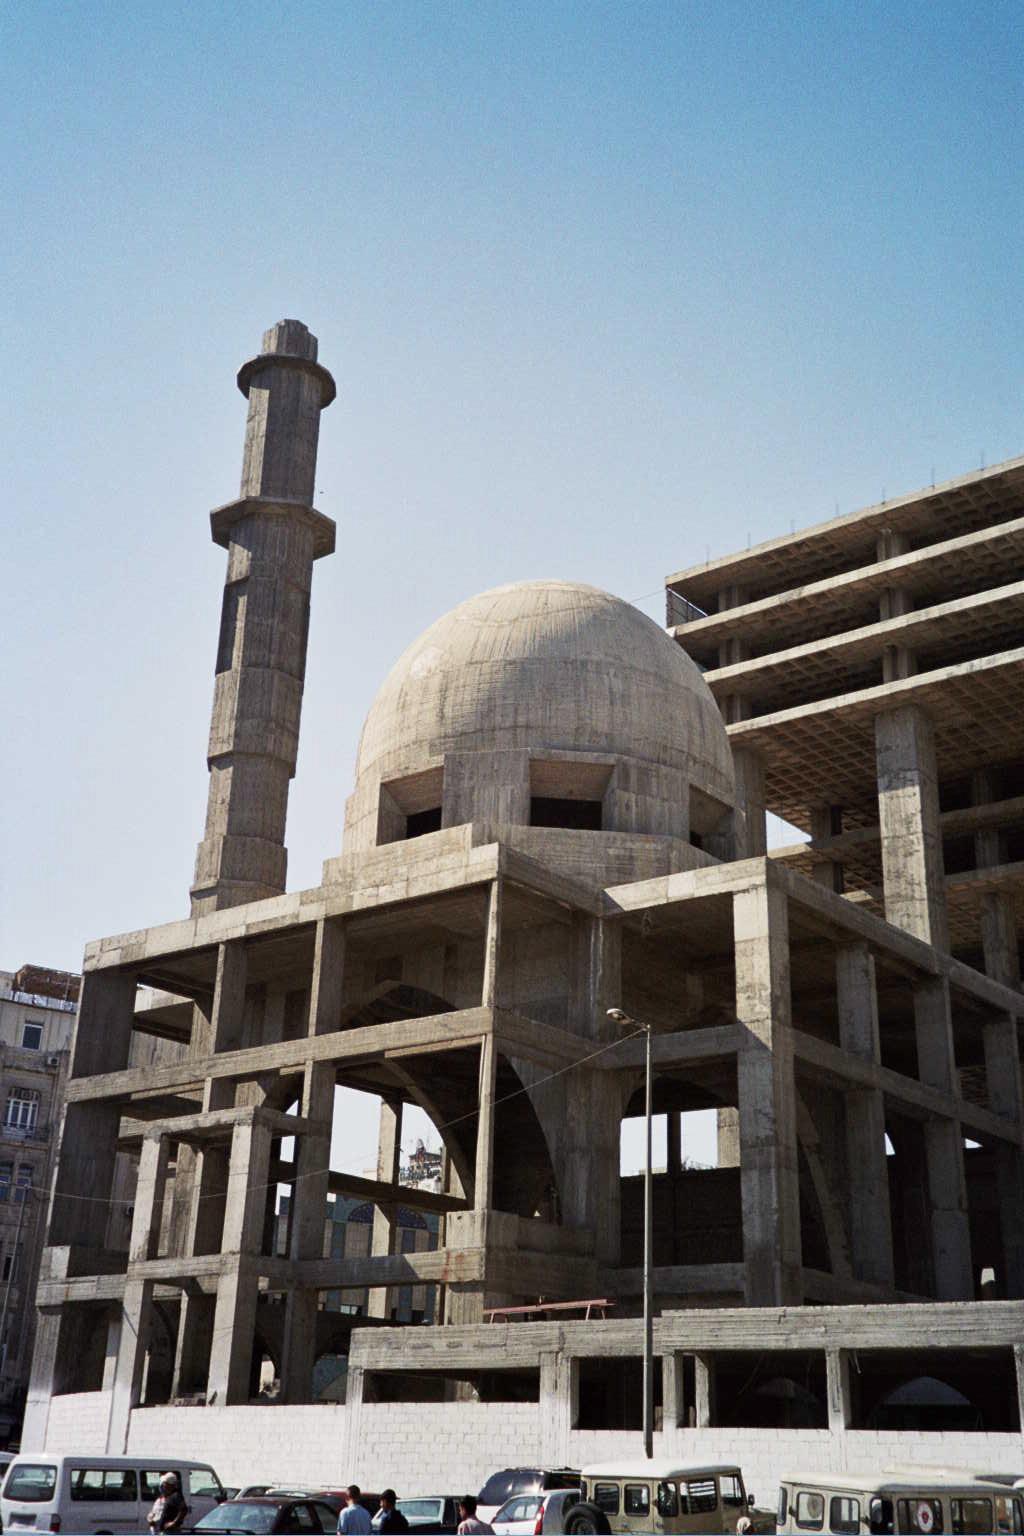 Mosque Construction Company File:mosque Under Construction